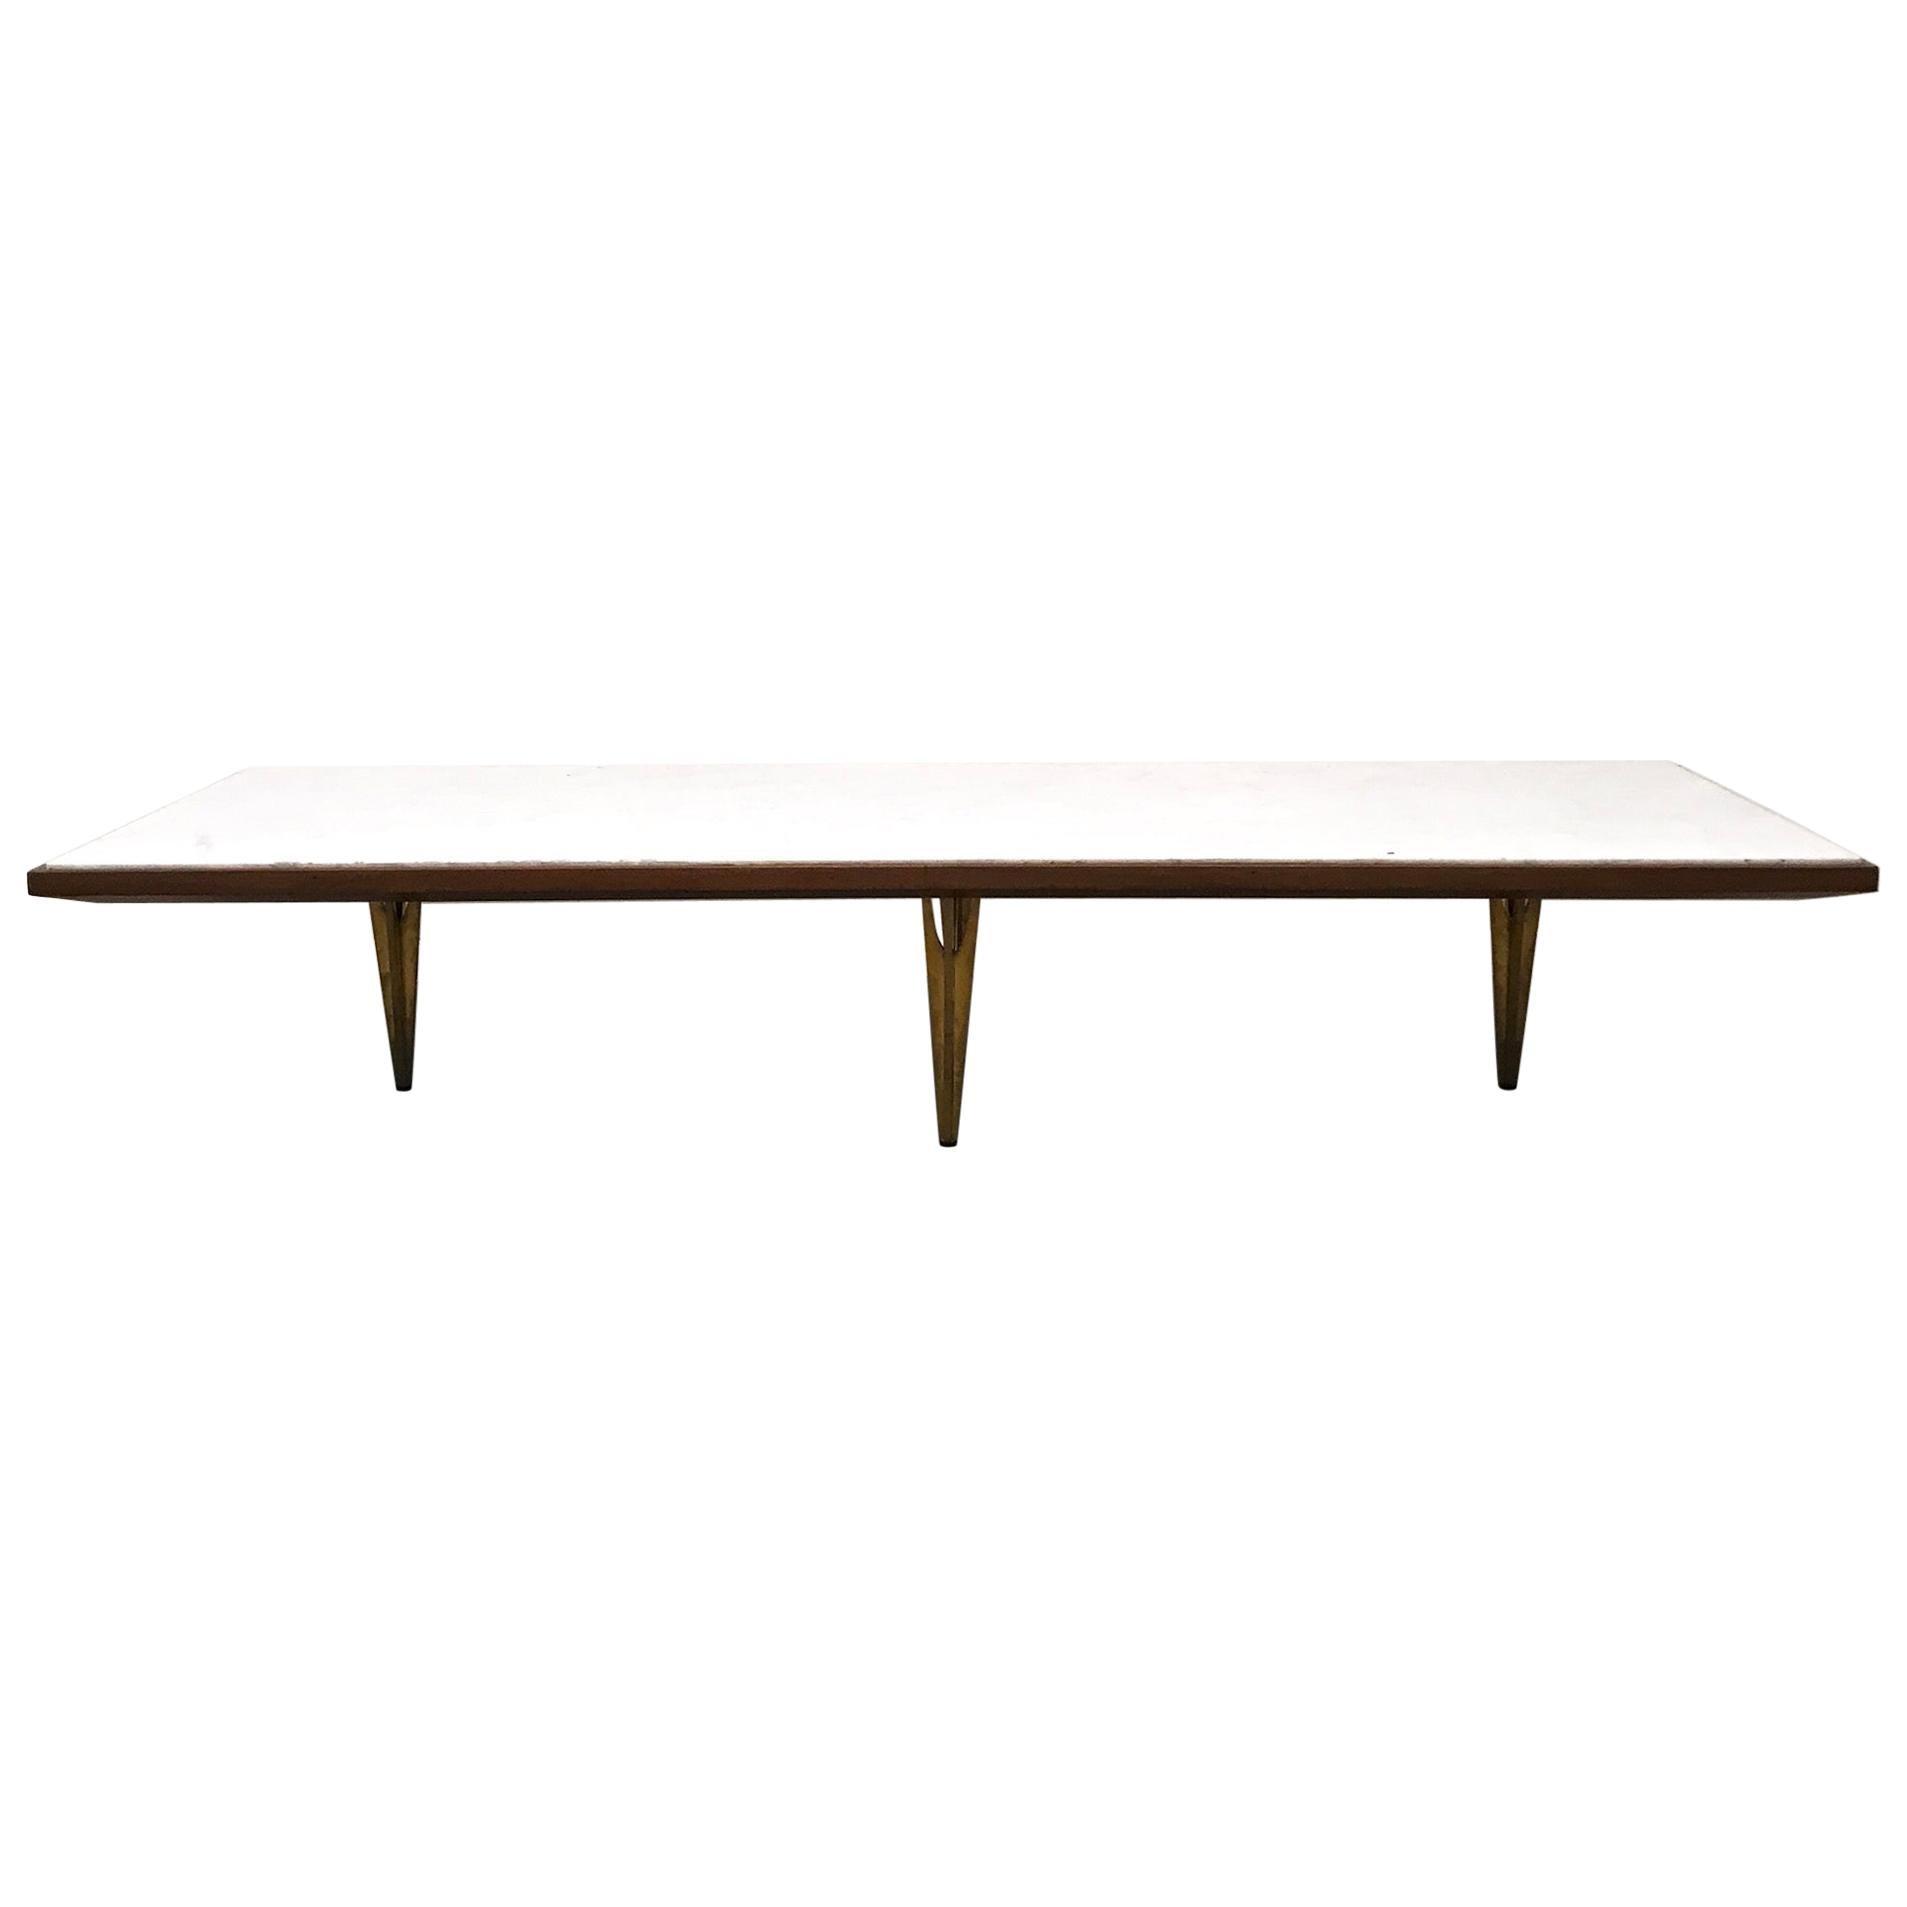 Arturo Pani Coffee Table